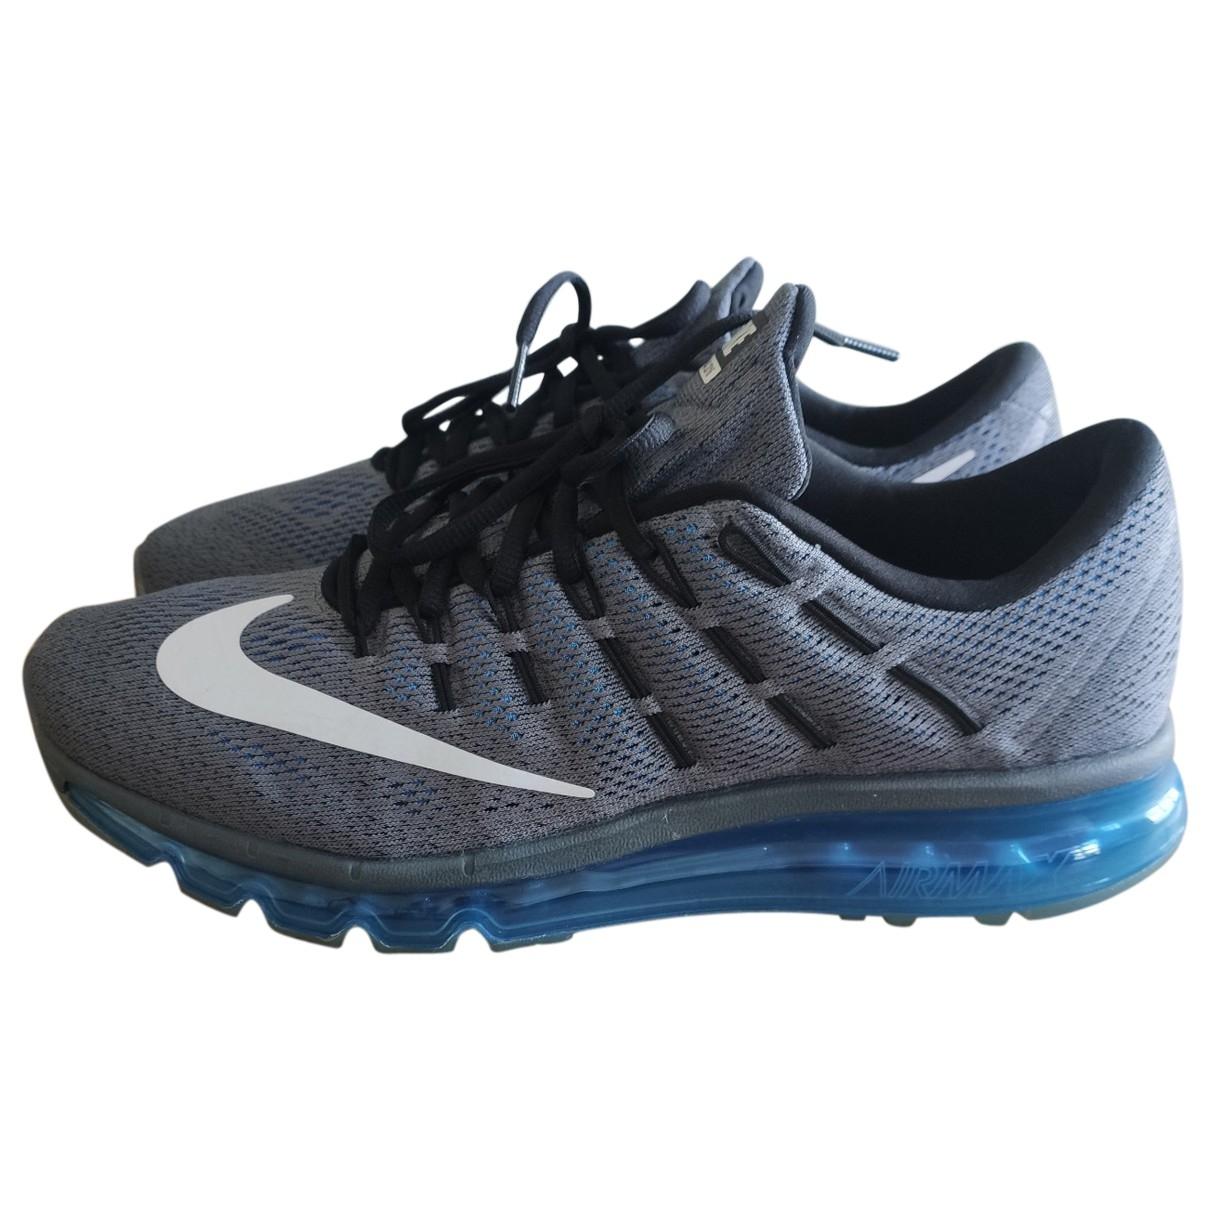 Nike Air Max  Grey Cloth Trainers for Men 45 EU